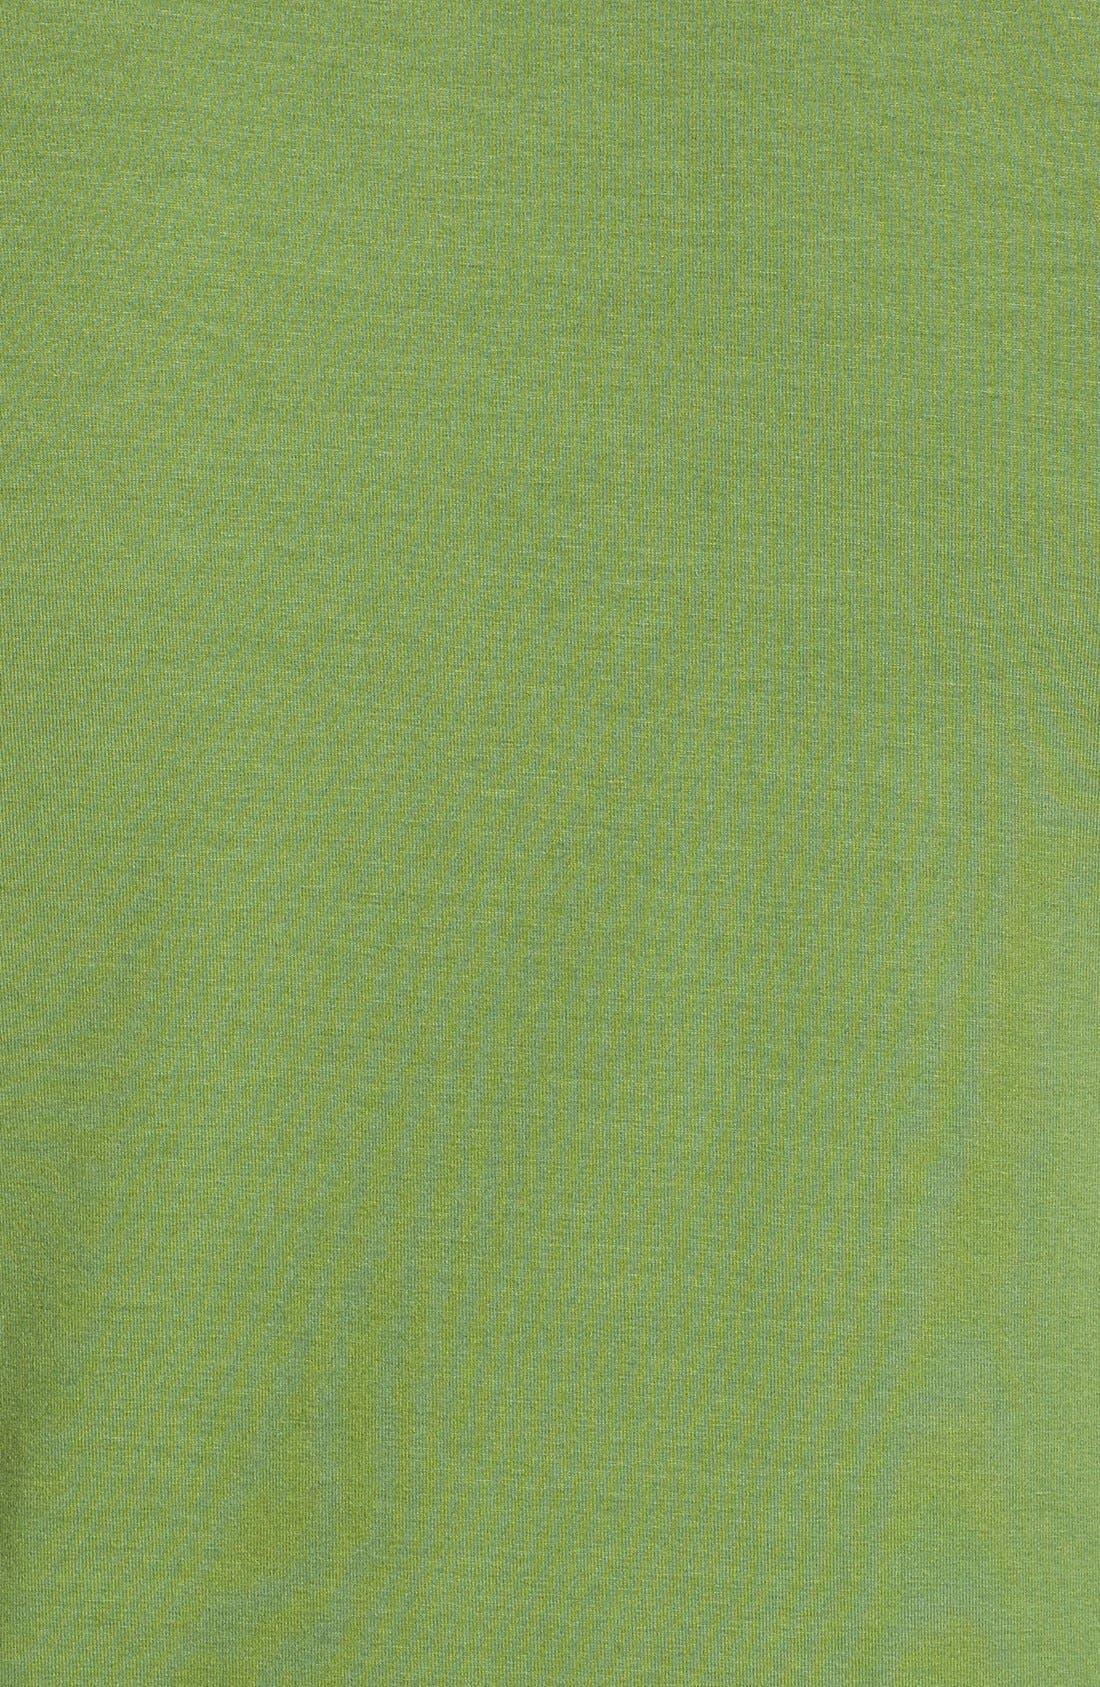 Alternate Image 5  - Vince Camuto Short Sleeve Side Pleat Asymmetrical Top (Plus Size)